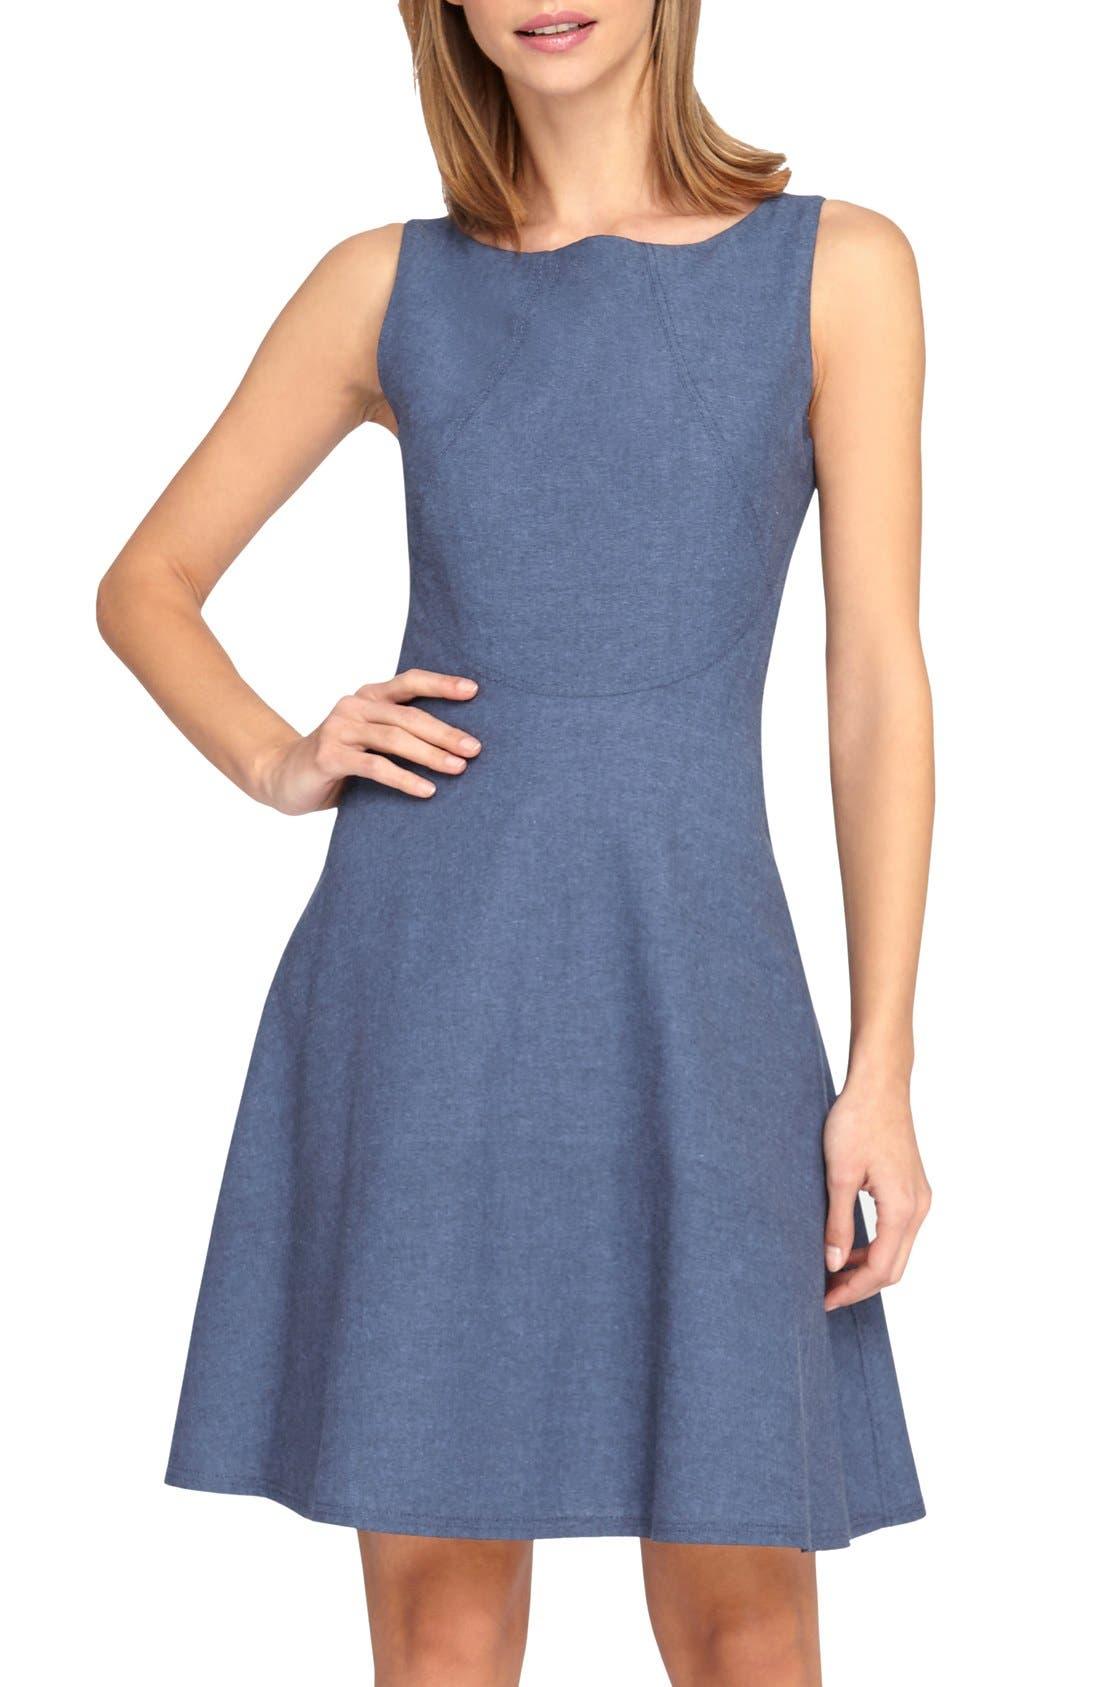 Alternate Image 1 Selected - Tahari Chambray Fit & Flare Dress